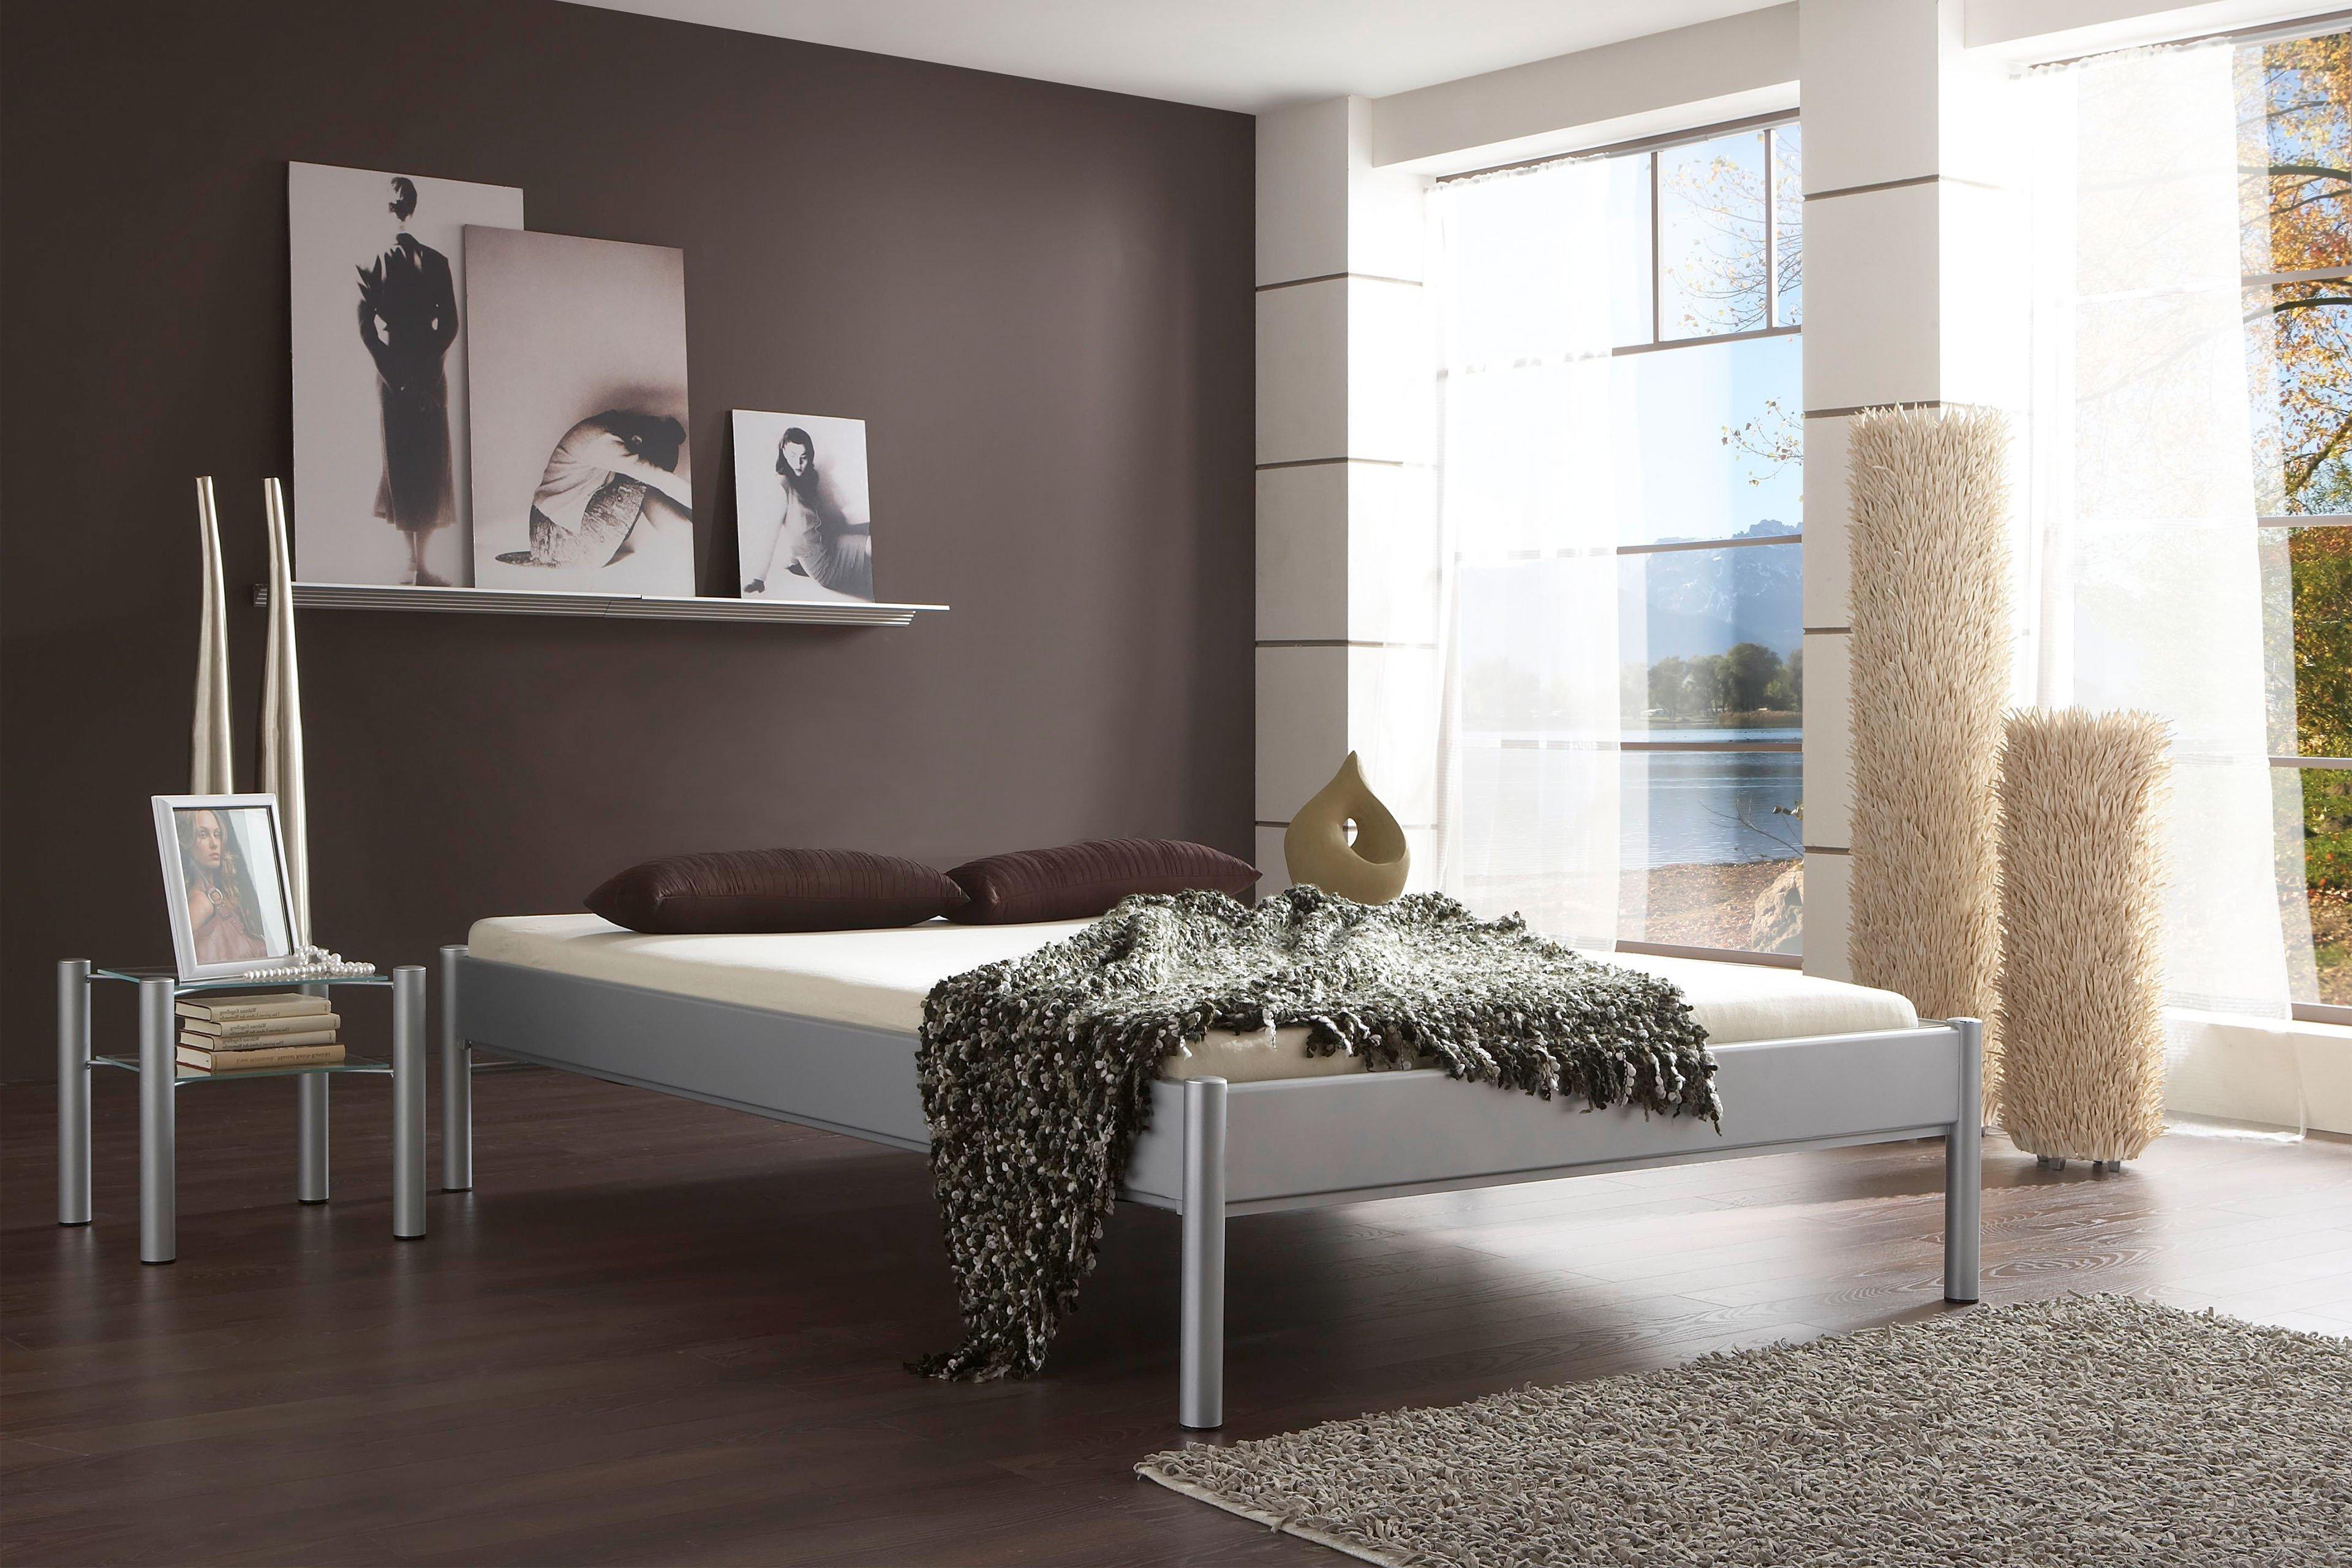 metallbett silber 140x200 free sam himmelbett x cm venezia metallbett cremewei inklusive. Black Bedroom Furniture Sets. Home Design Ideas